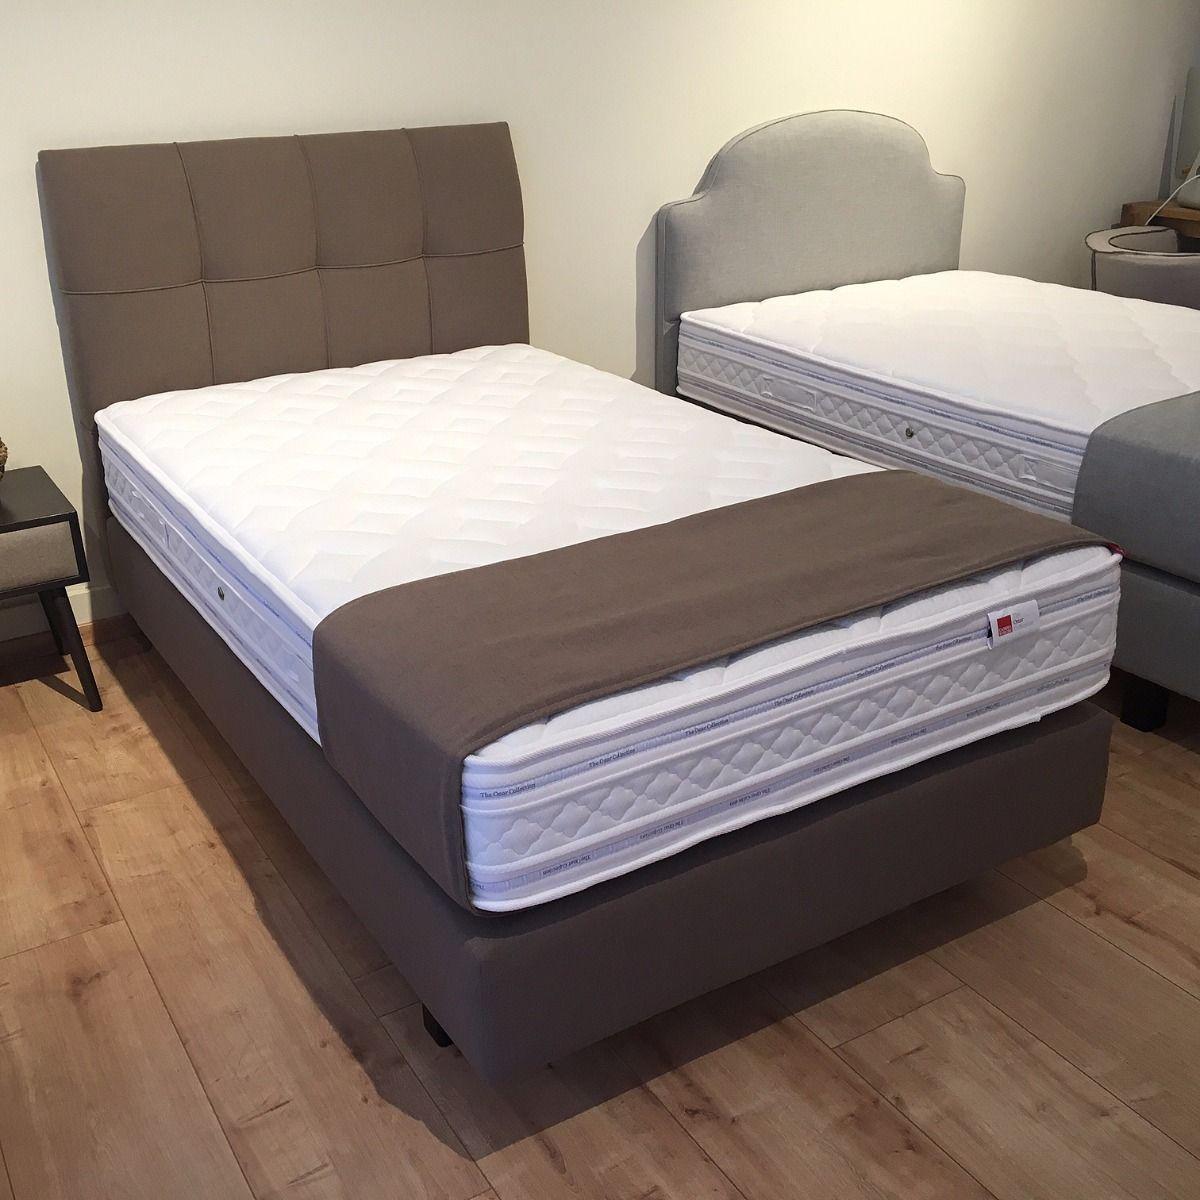 boxspringbetten berlin by candia strom designer betten luxusbetten amerikanische betten. Black Bedroom Furniture Sets. Home Design Ideas